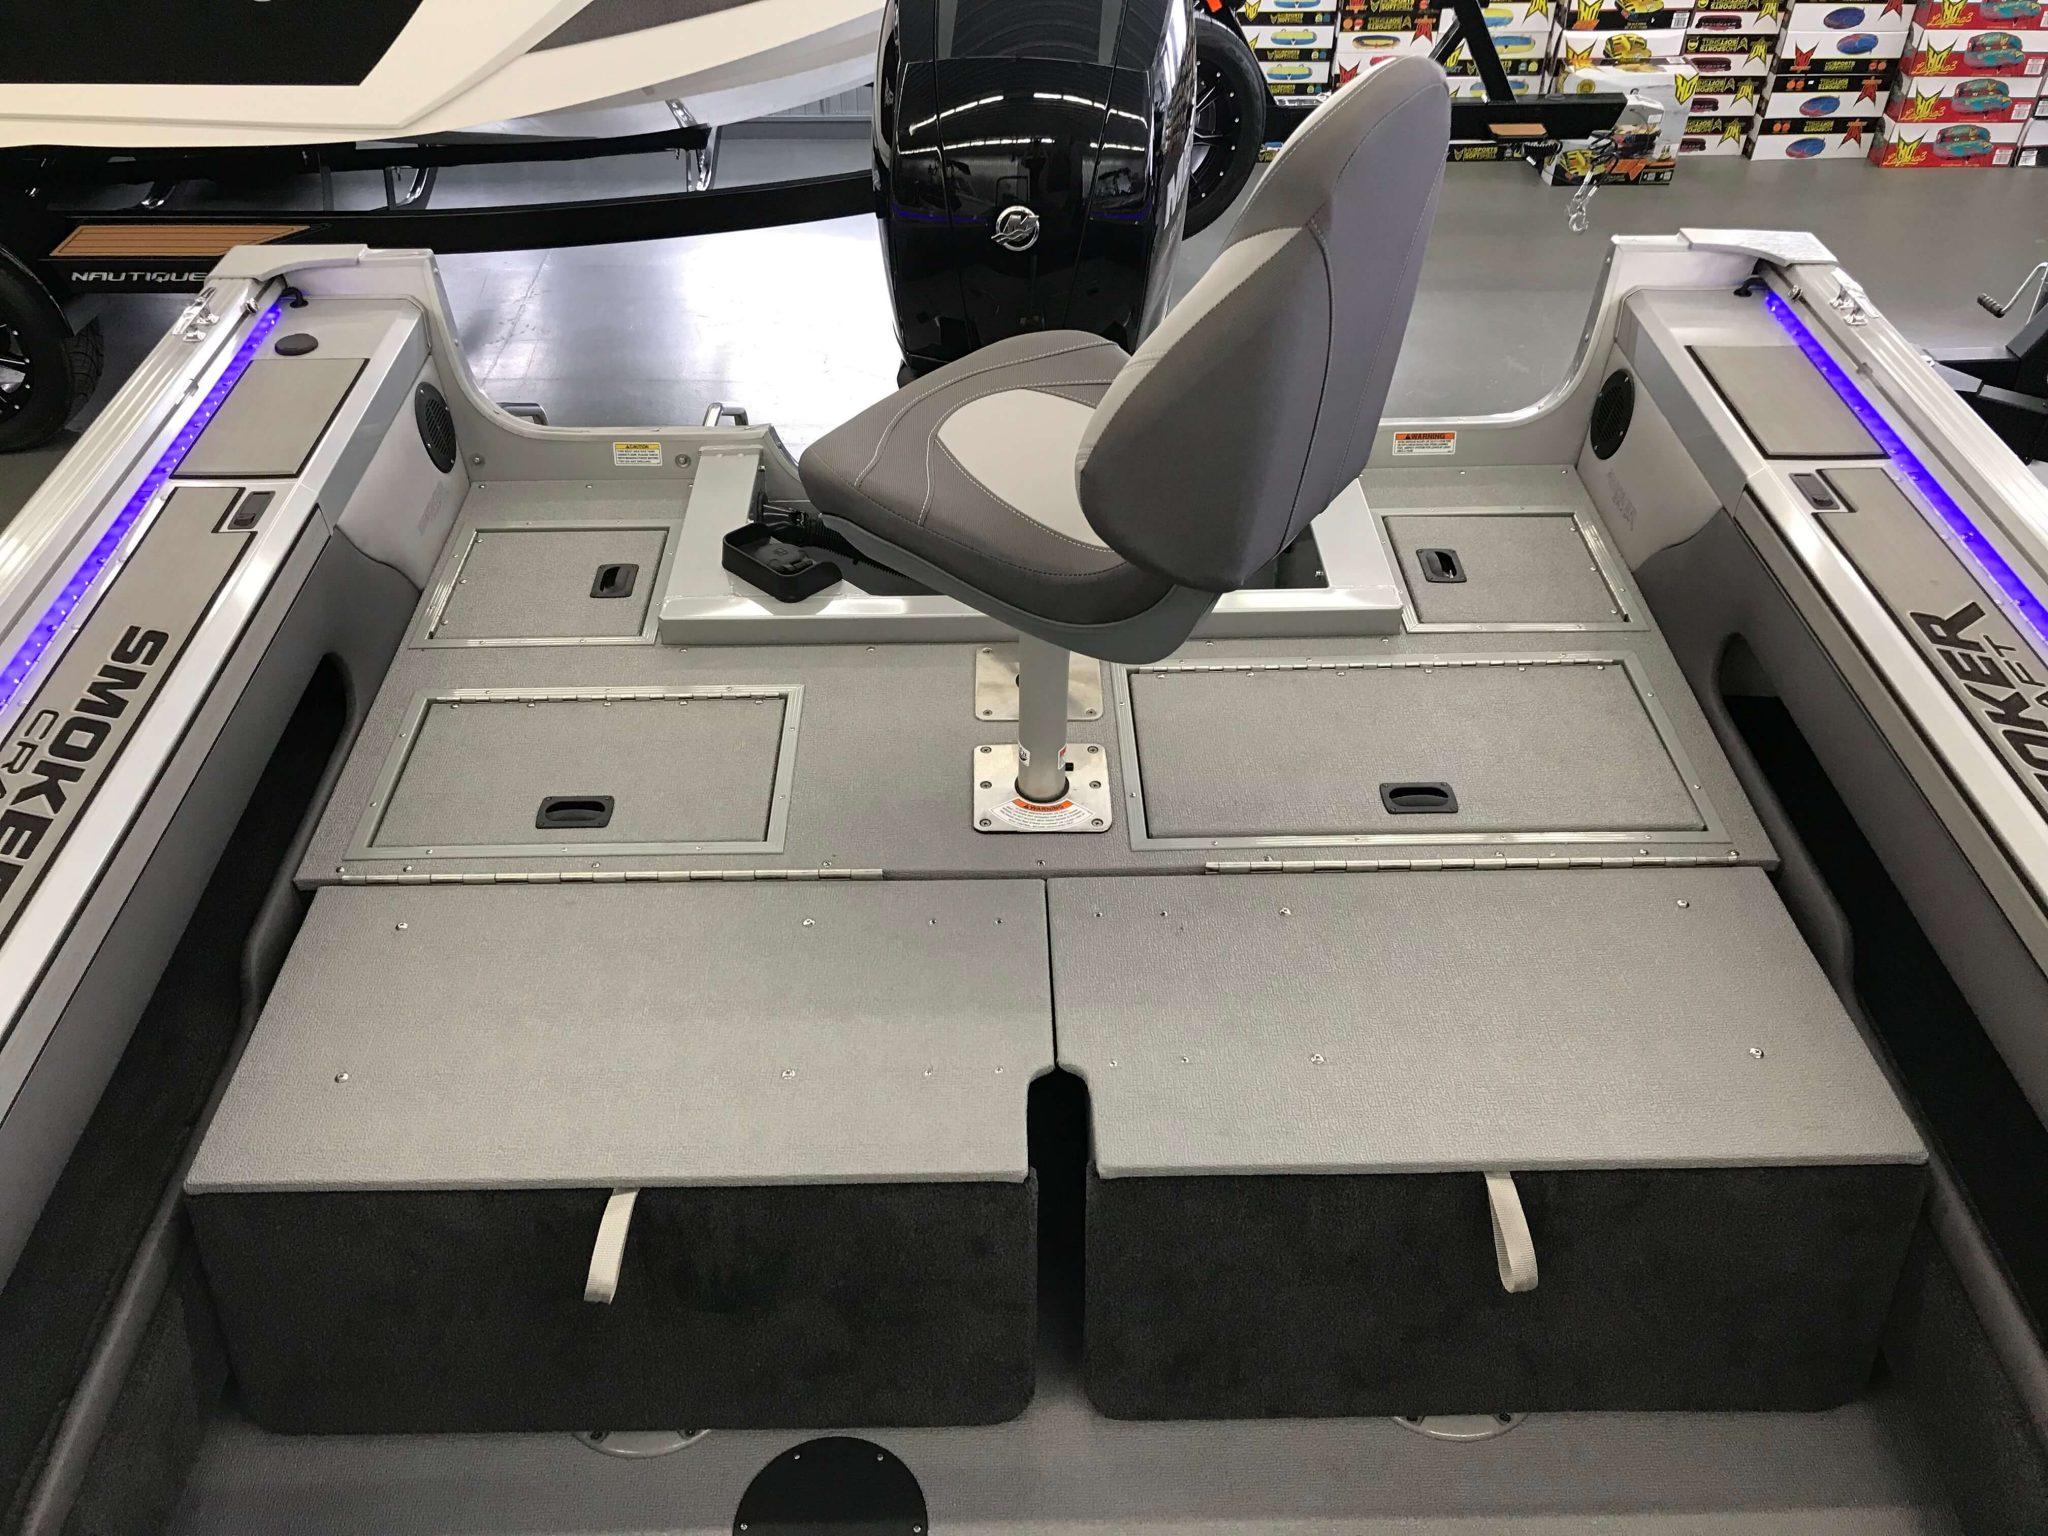 2019 Smoker Craft 182 Pro Angler XL Interior Cockpit Layout 3